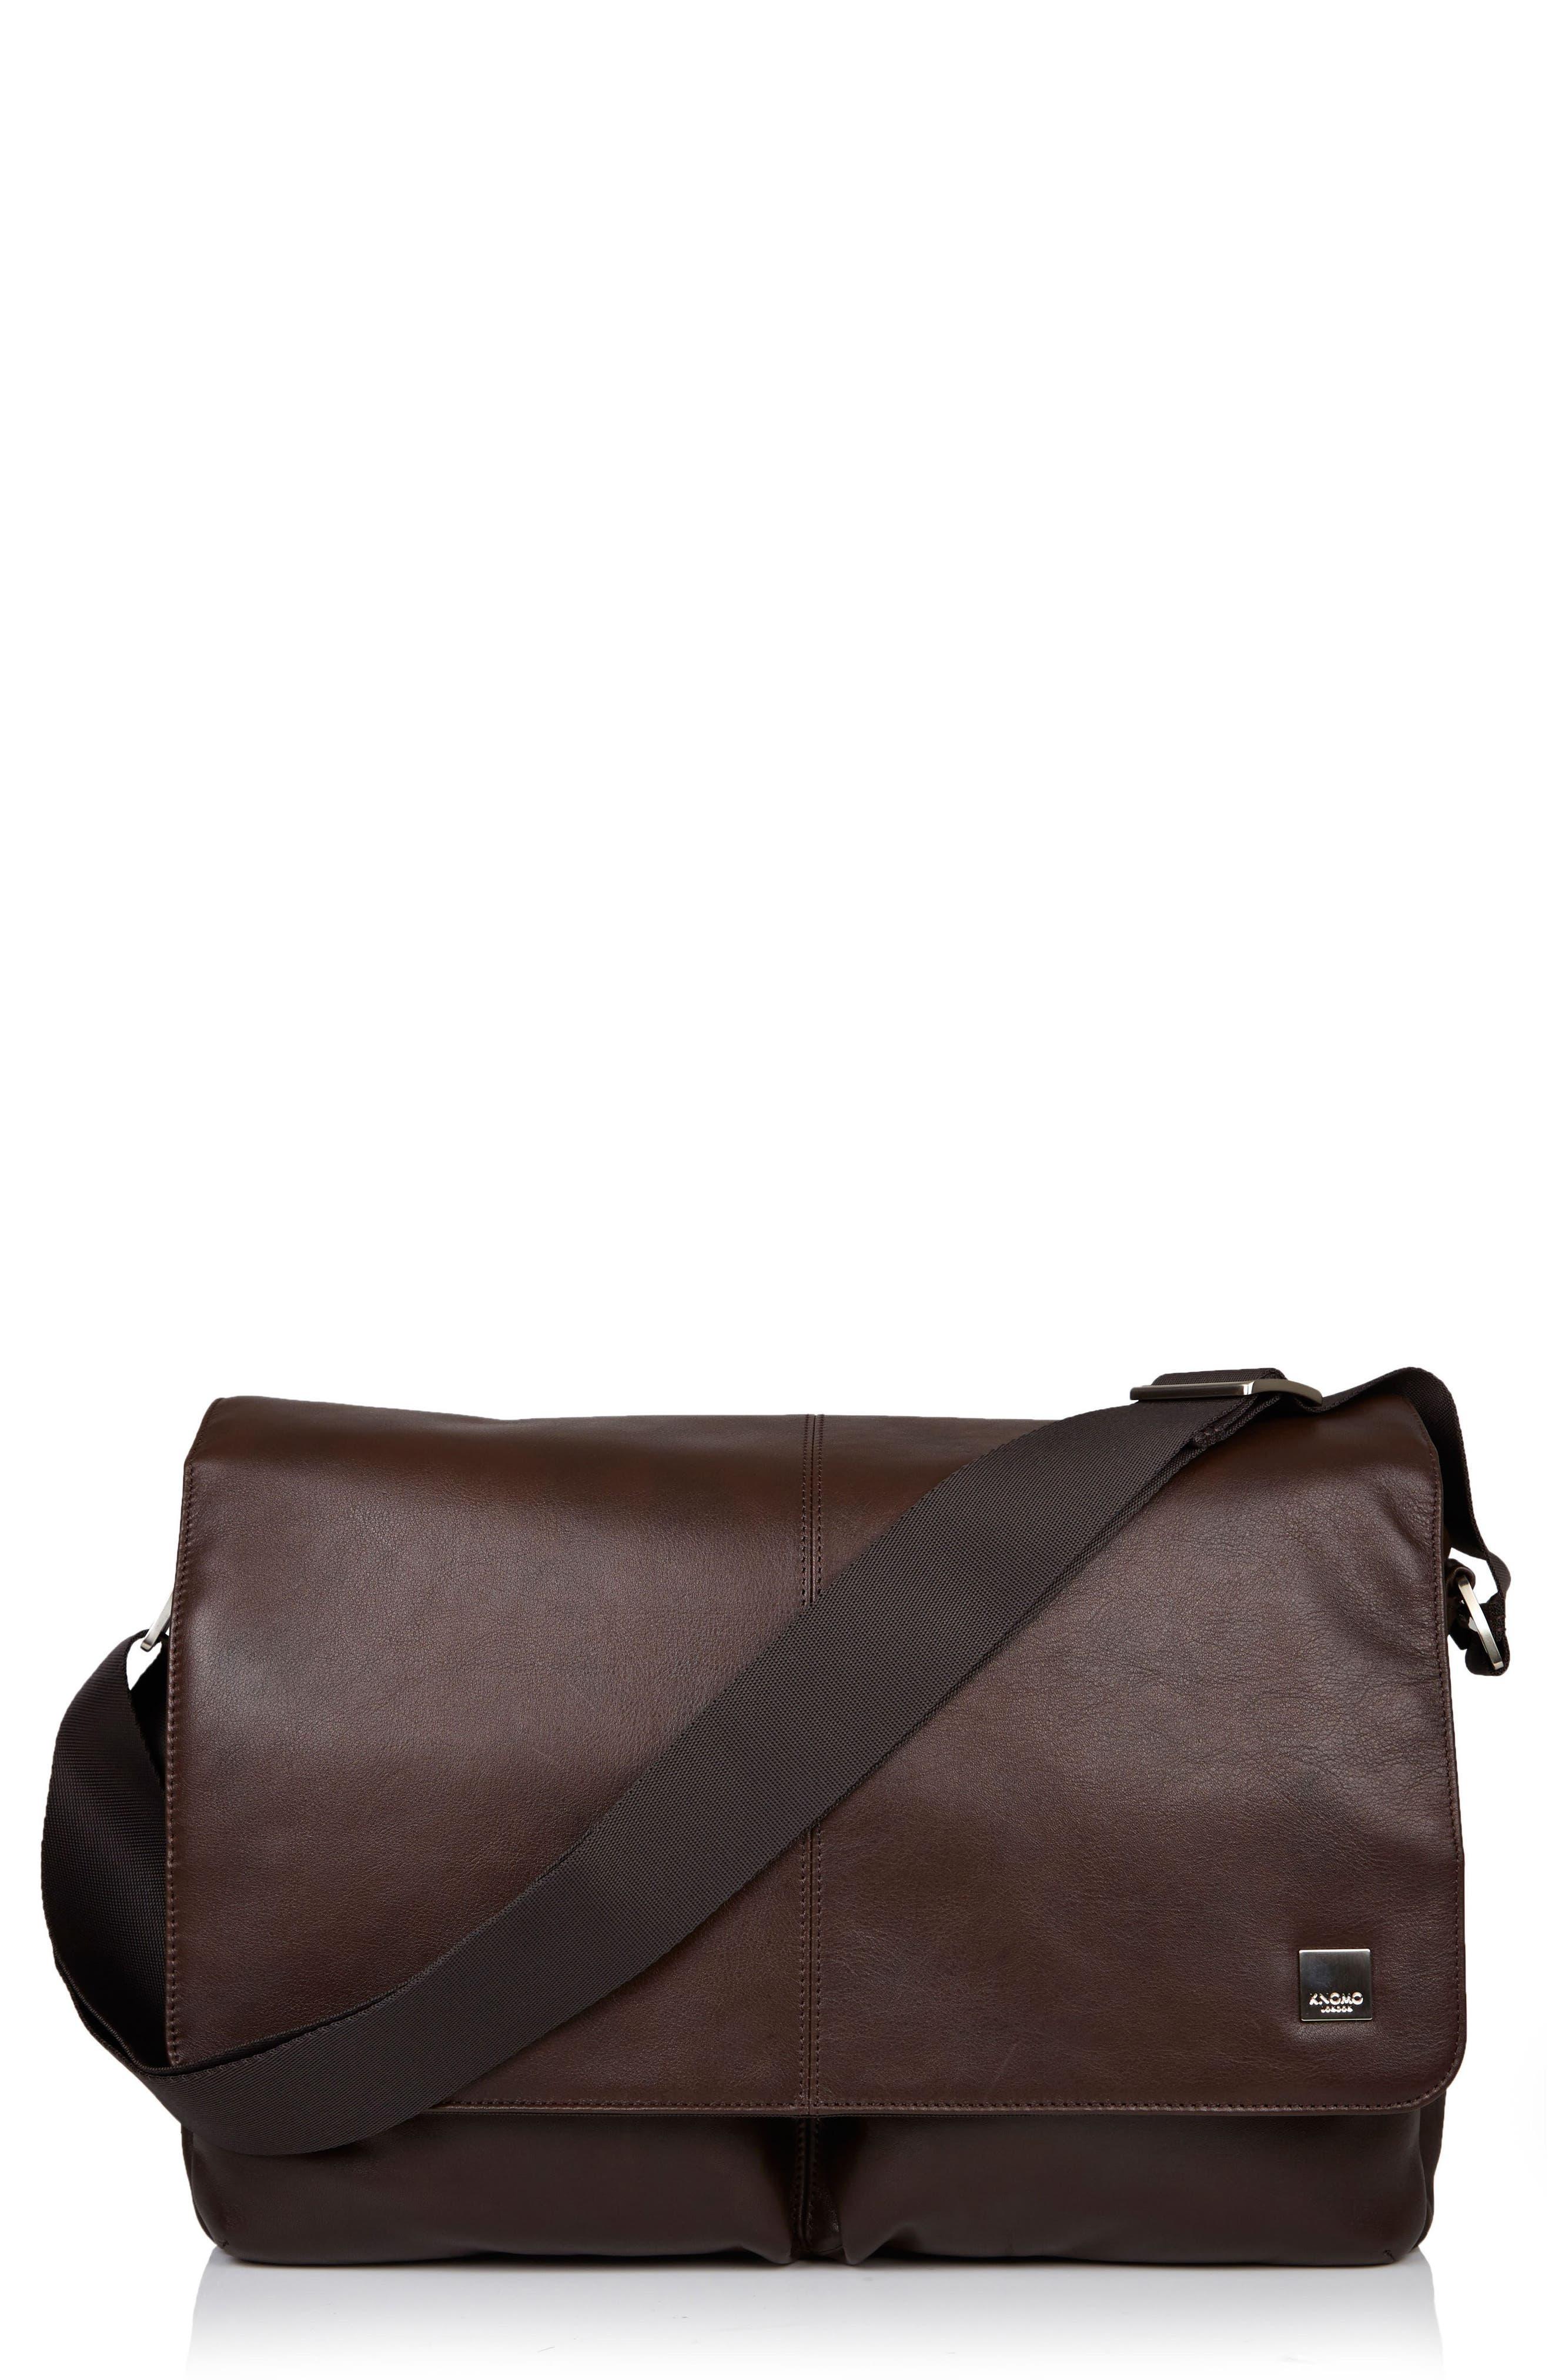 KNOMO LONDON Brompton Kobe RFID Leather Messenger Bag